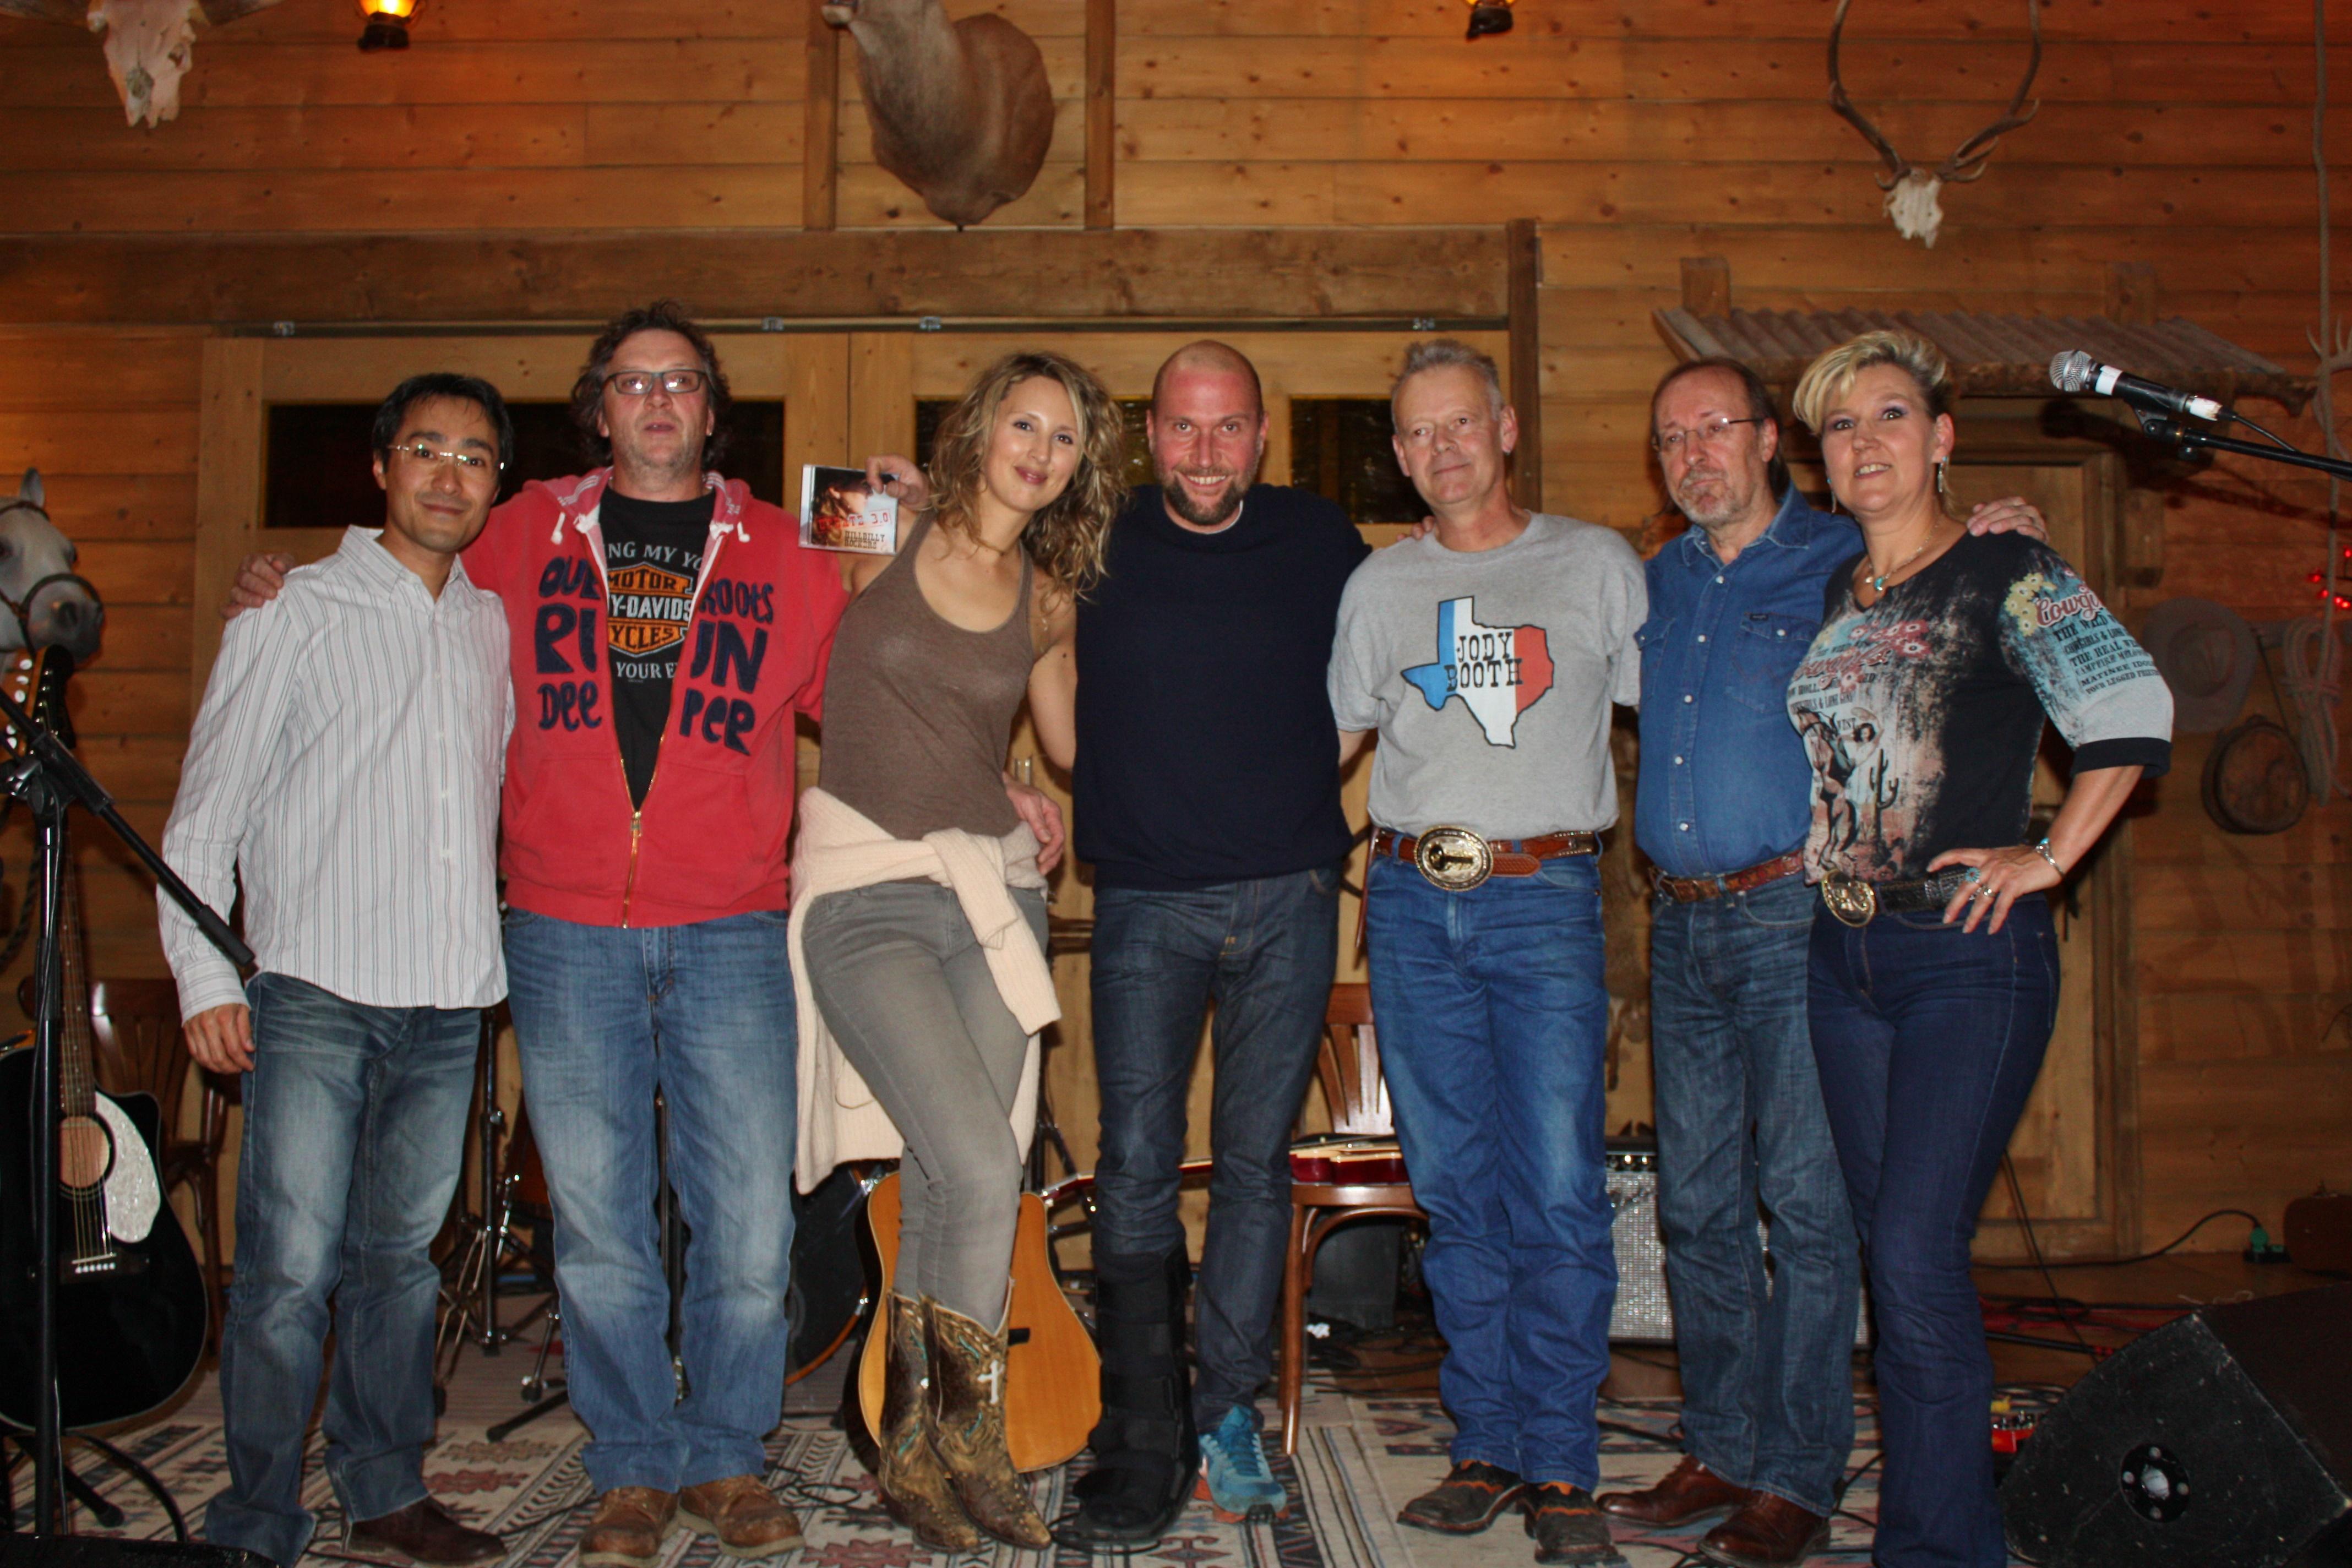 Hillbilly Rockers, Claudine et François Damiens au Cowboy Barn